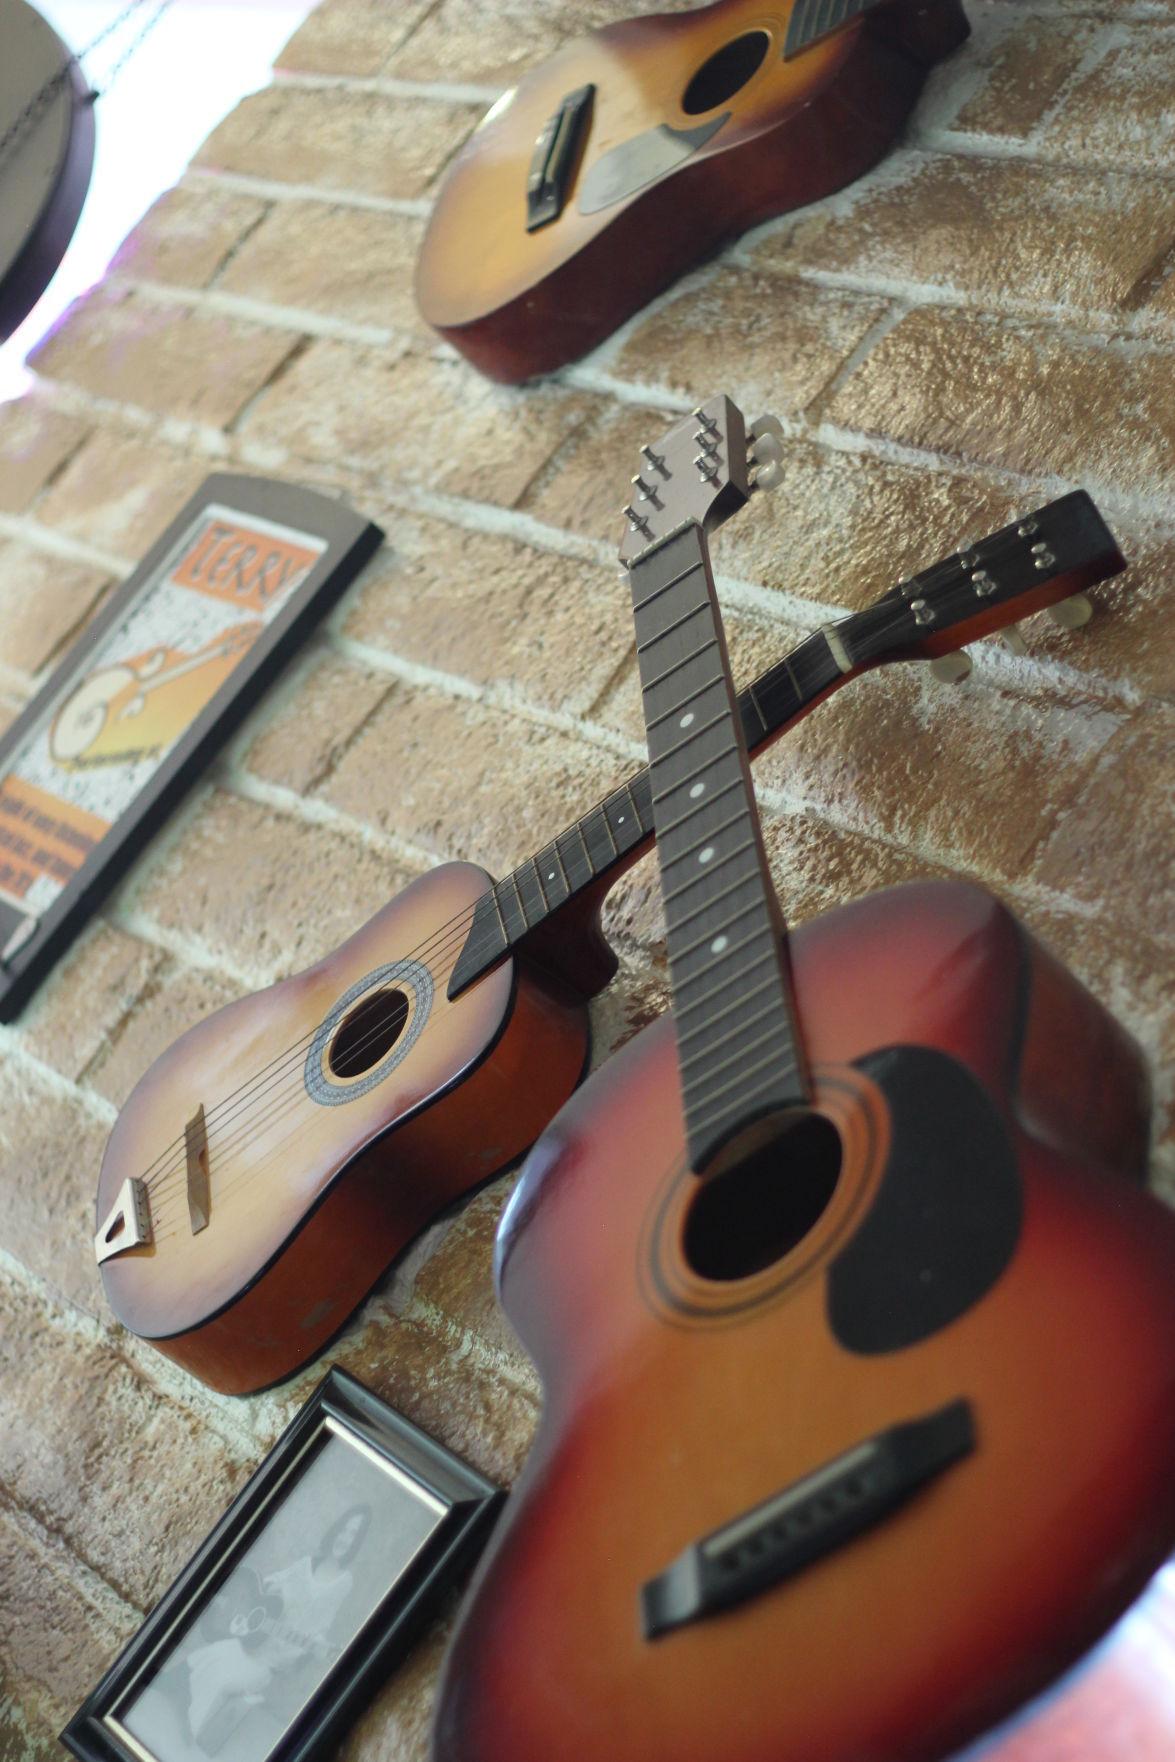 Guitar decorations